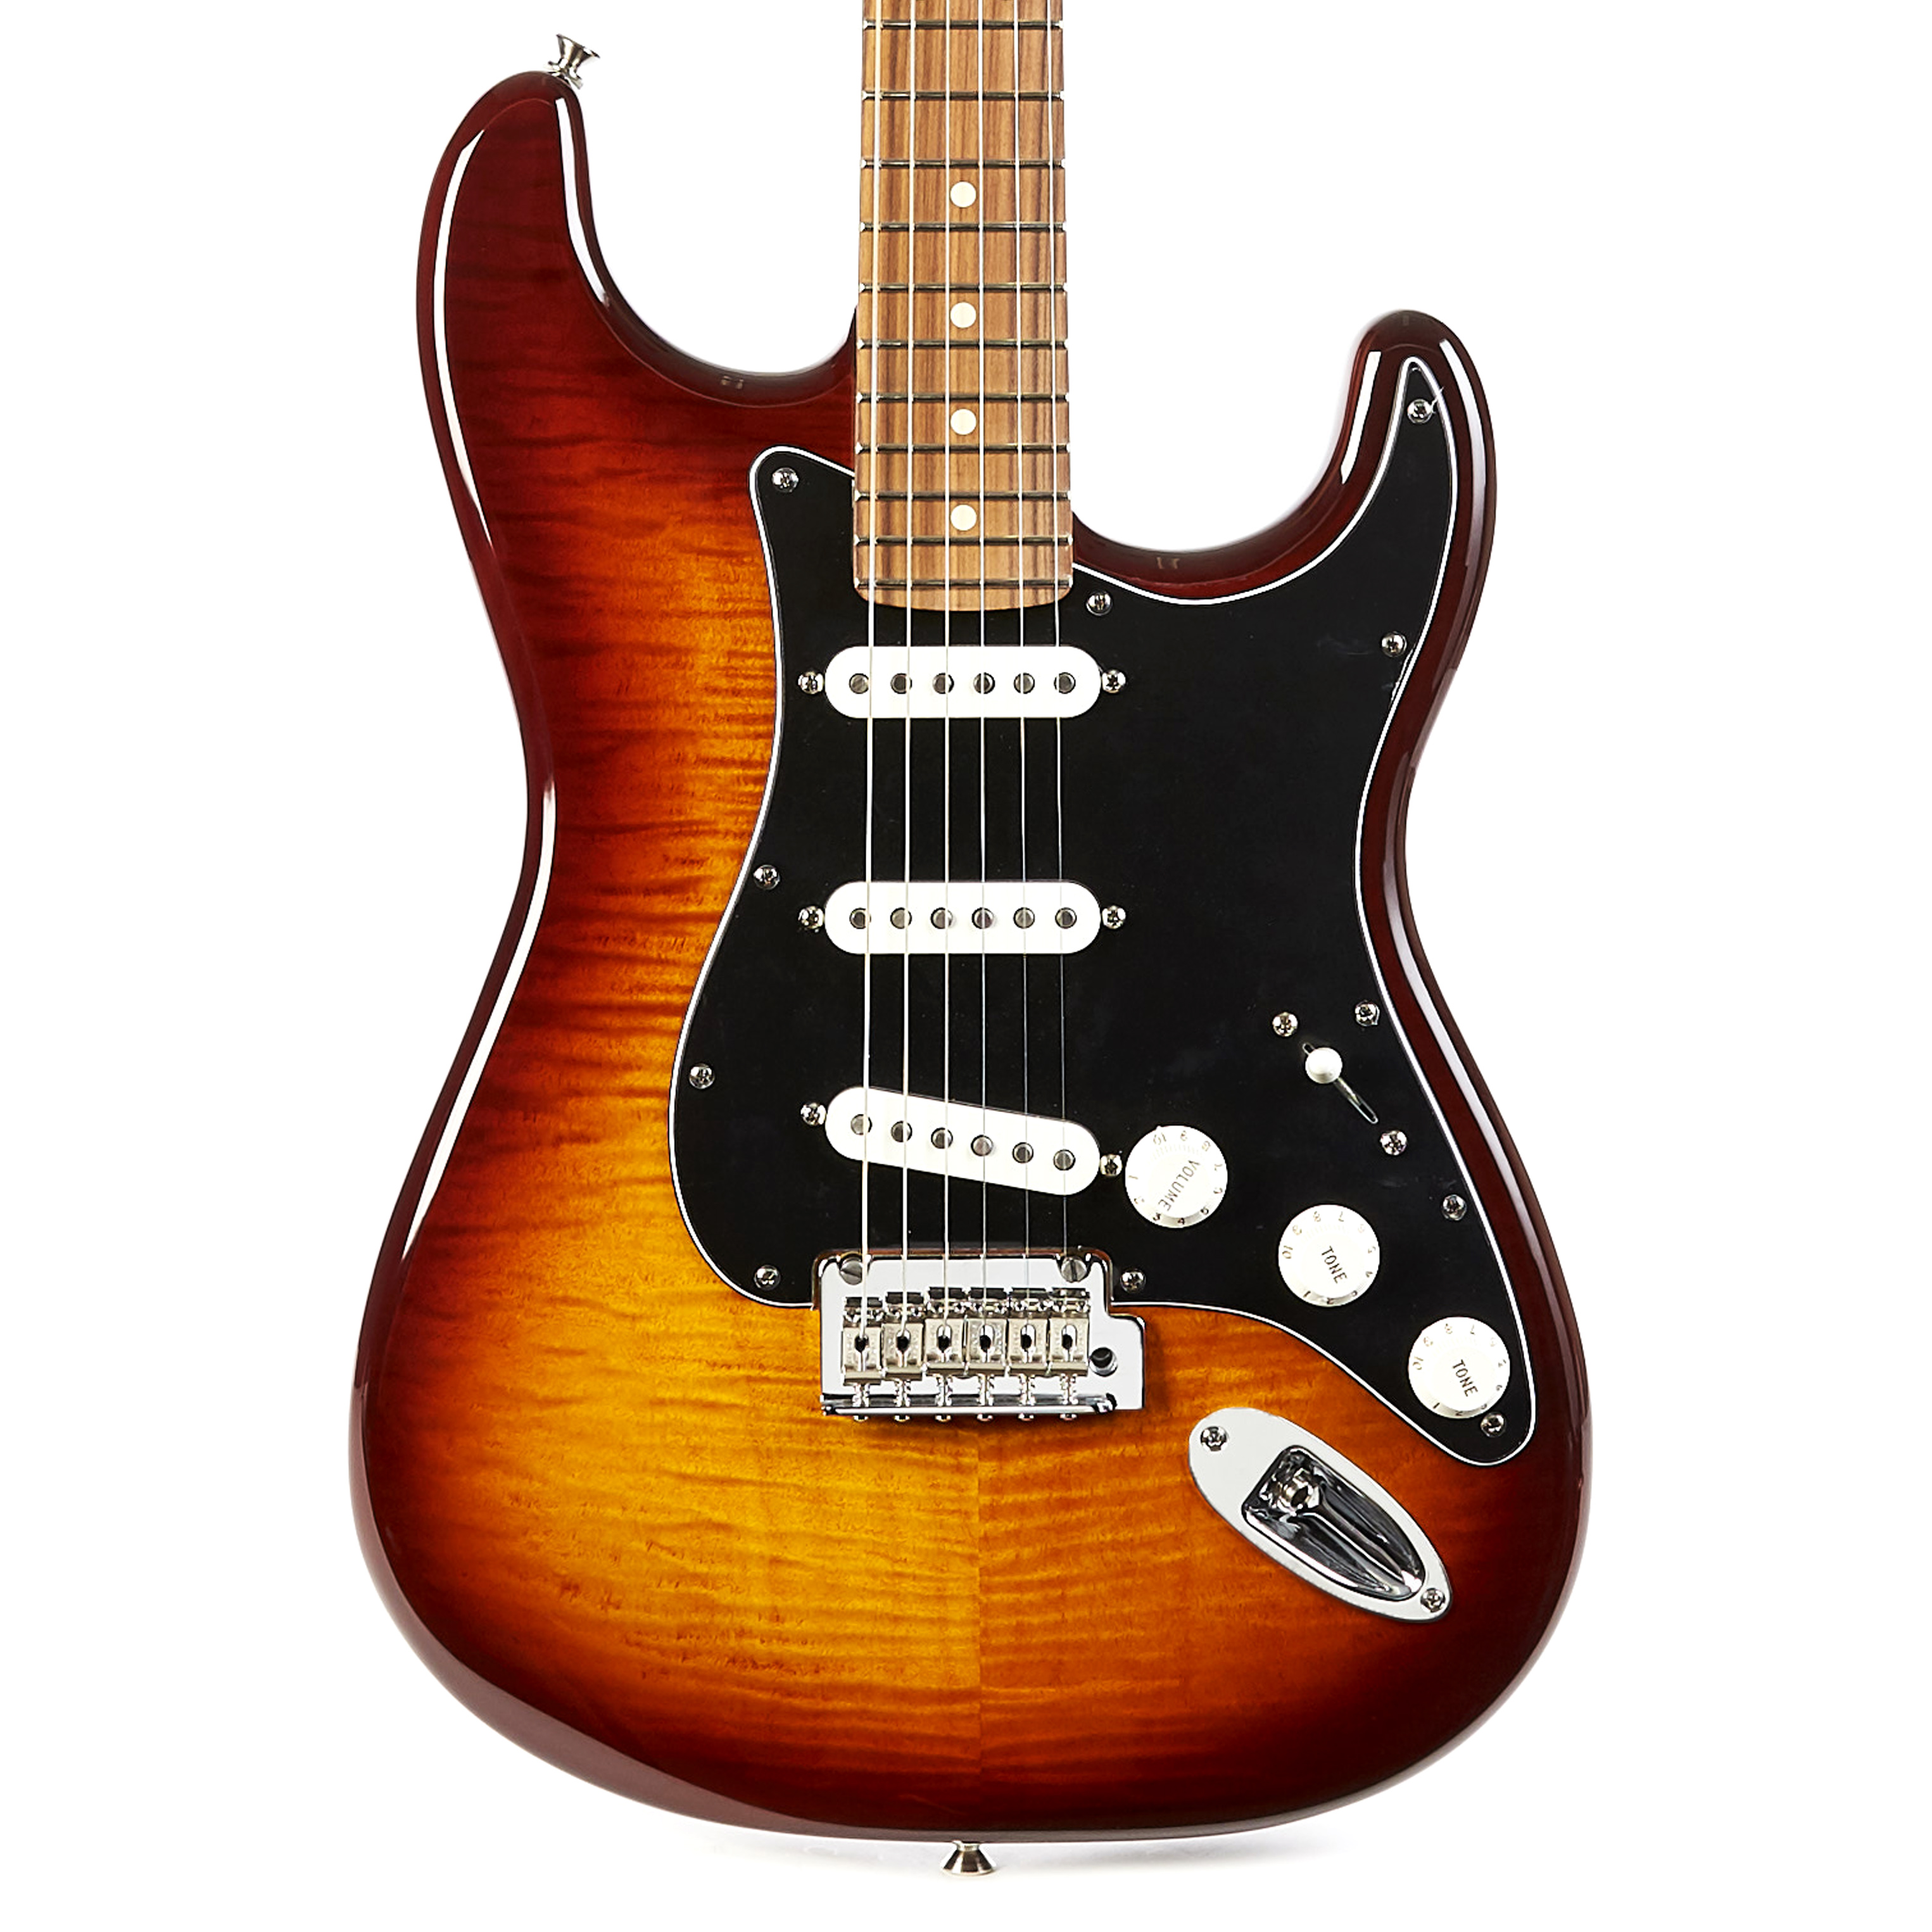 Details about Fender Player Series Stratocaster Plus Top Pau Ferro -  Tobacco Burst Demo